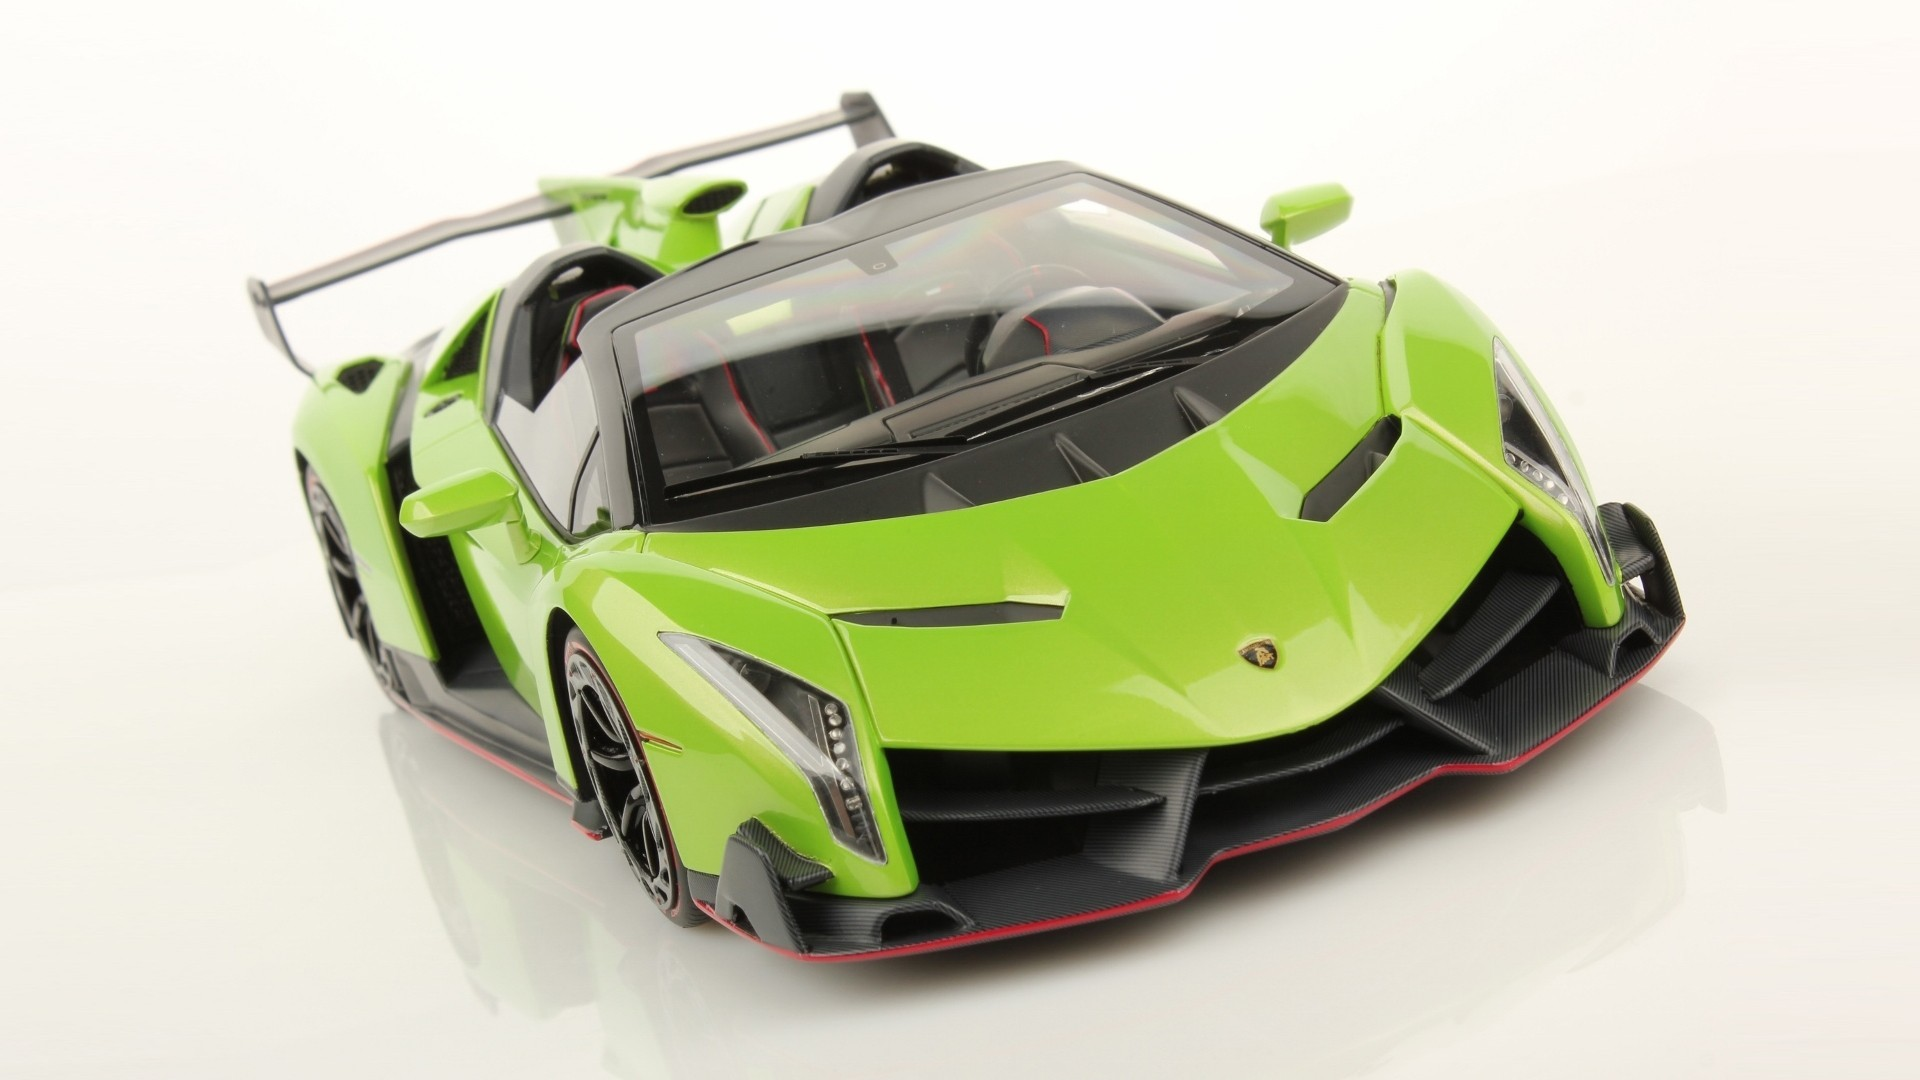 car, Vehicle, Green Cars, Lamborghini Veneno, Lamborghini Veneno Roadster  Wallpapers HD / Desktop and Mobile Backgrounds